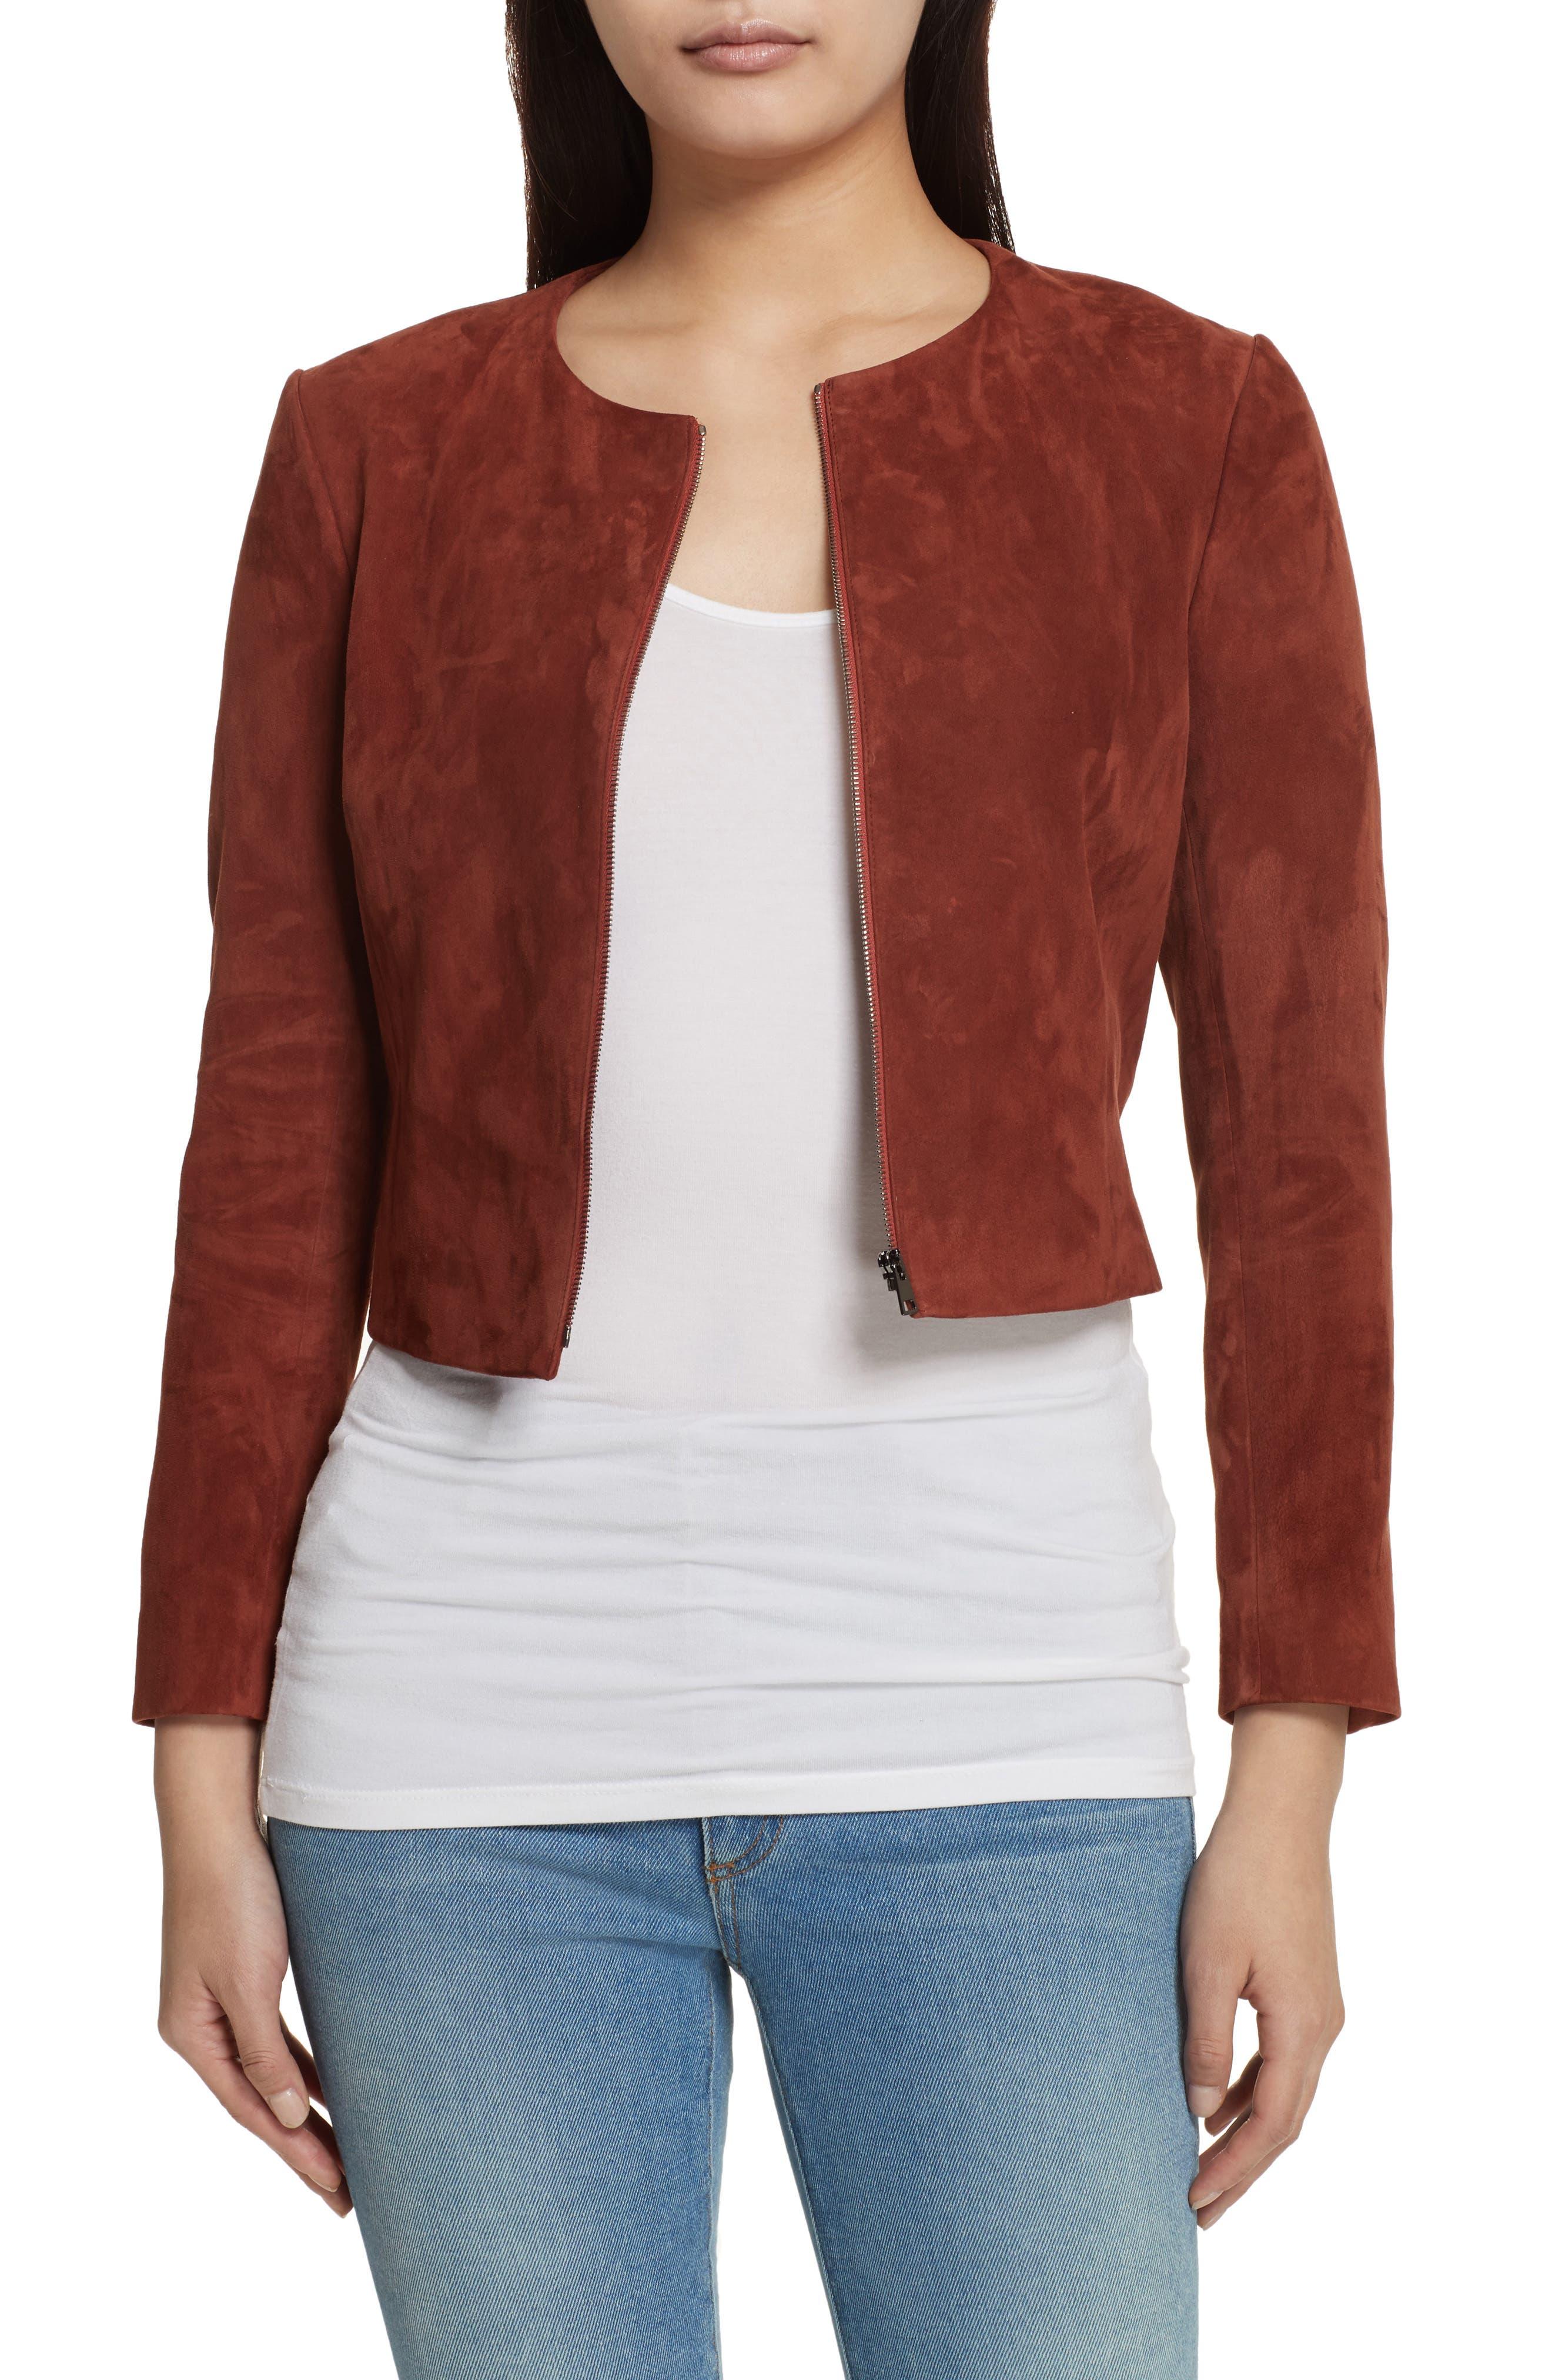 Morene Stretch Suede Jacket,                         Main,                         color, Brown Russet